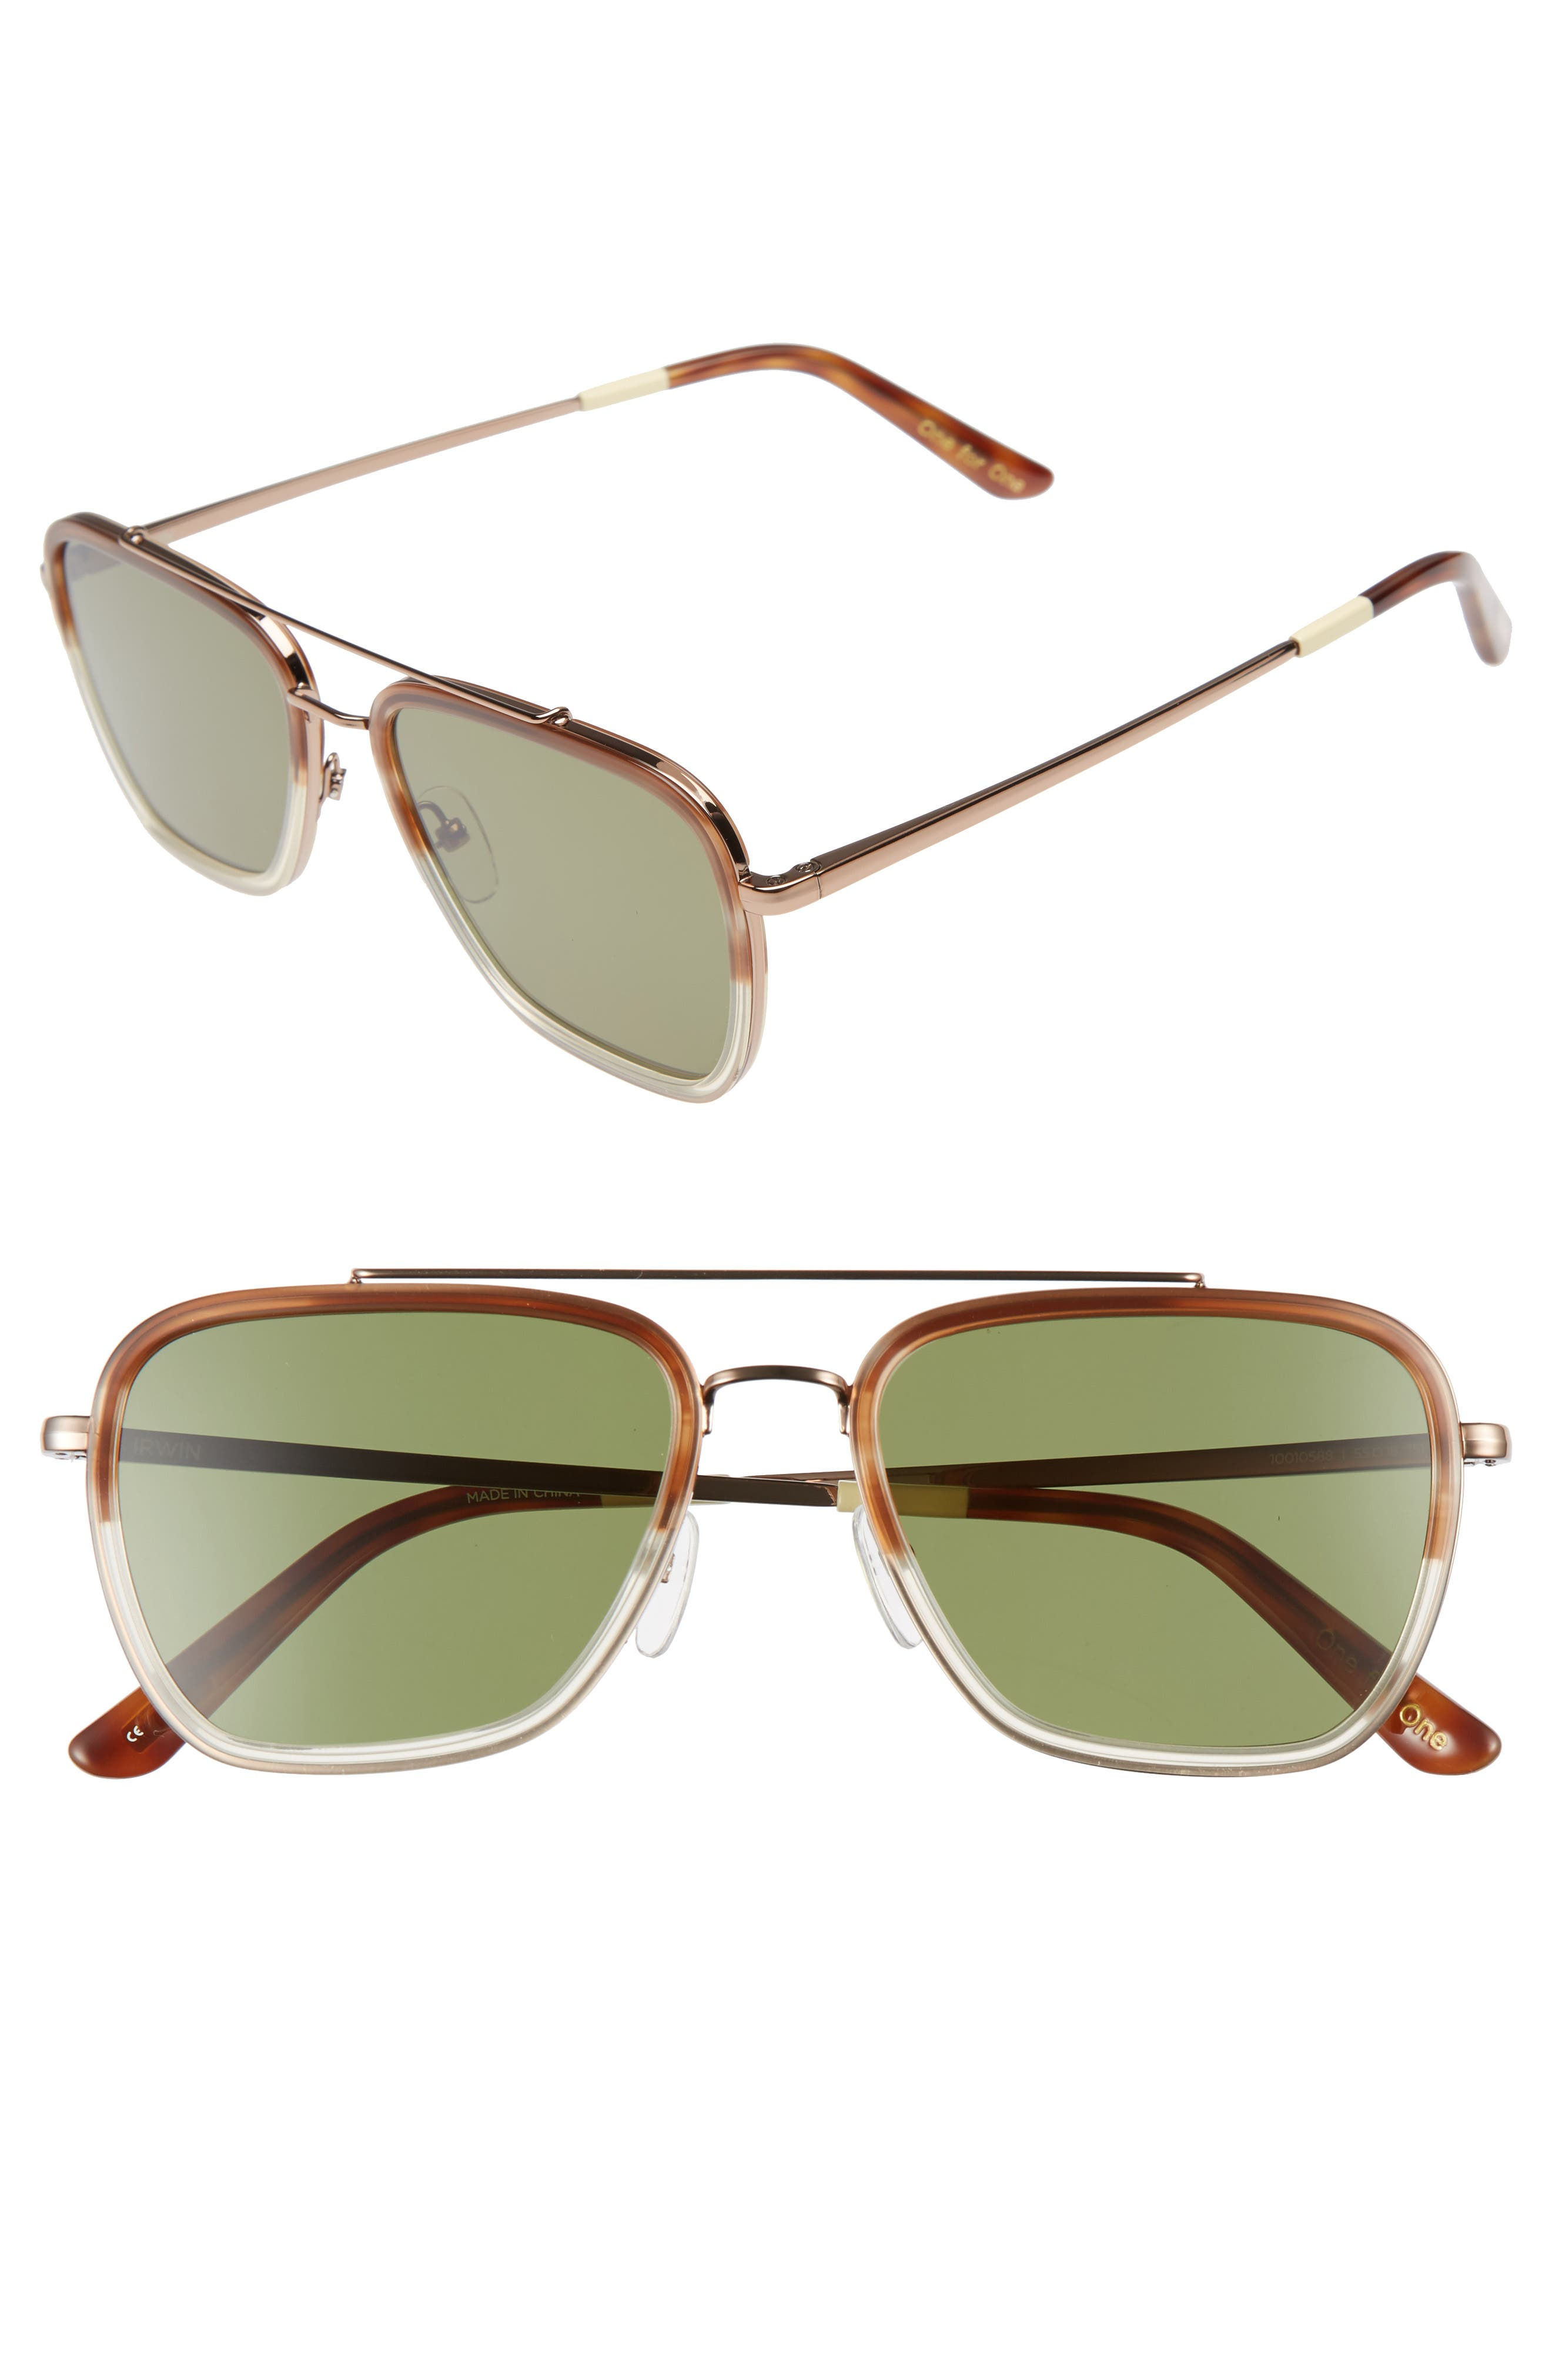 Irwin 55mm Sunglasses,                         Main,                         color, 205